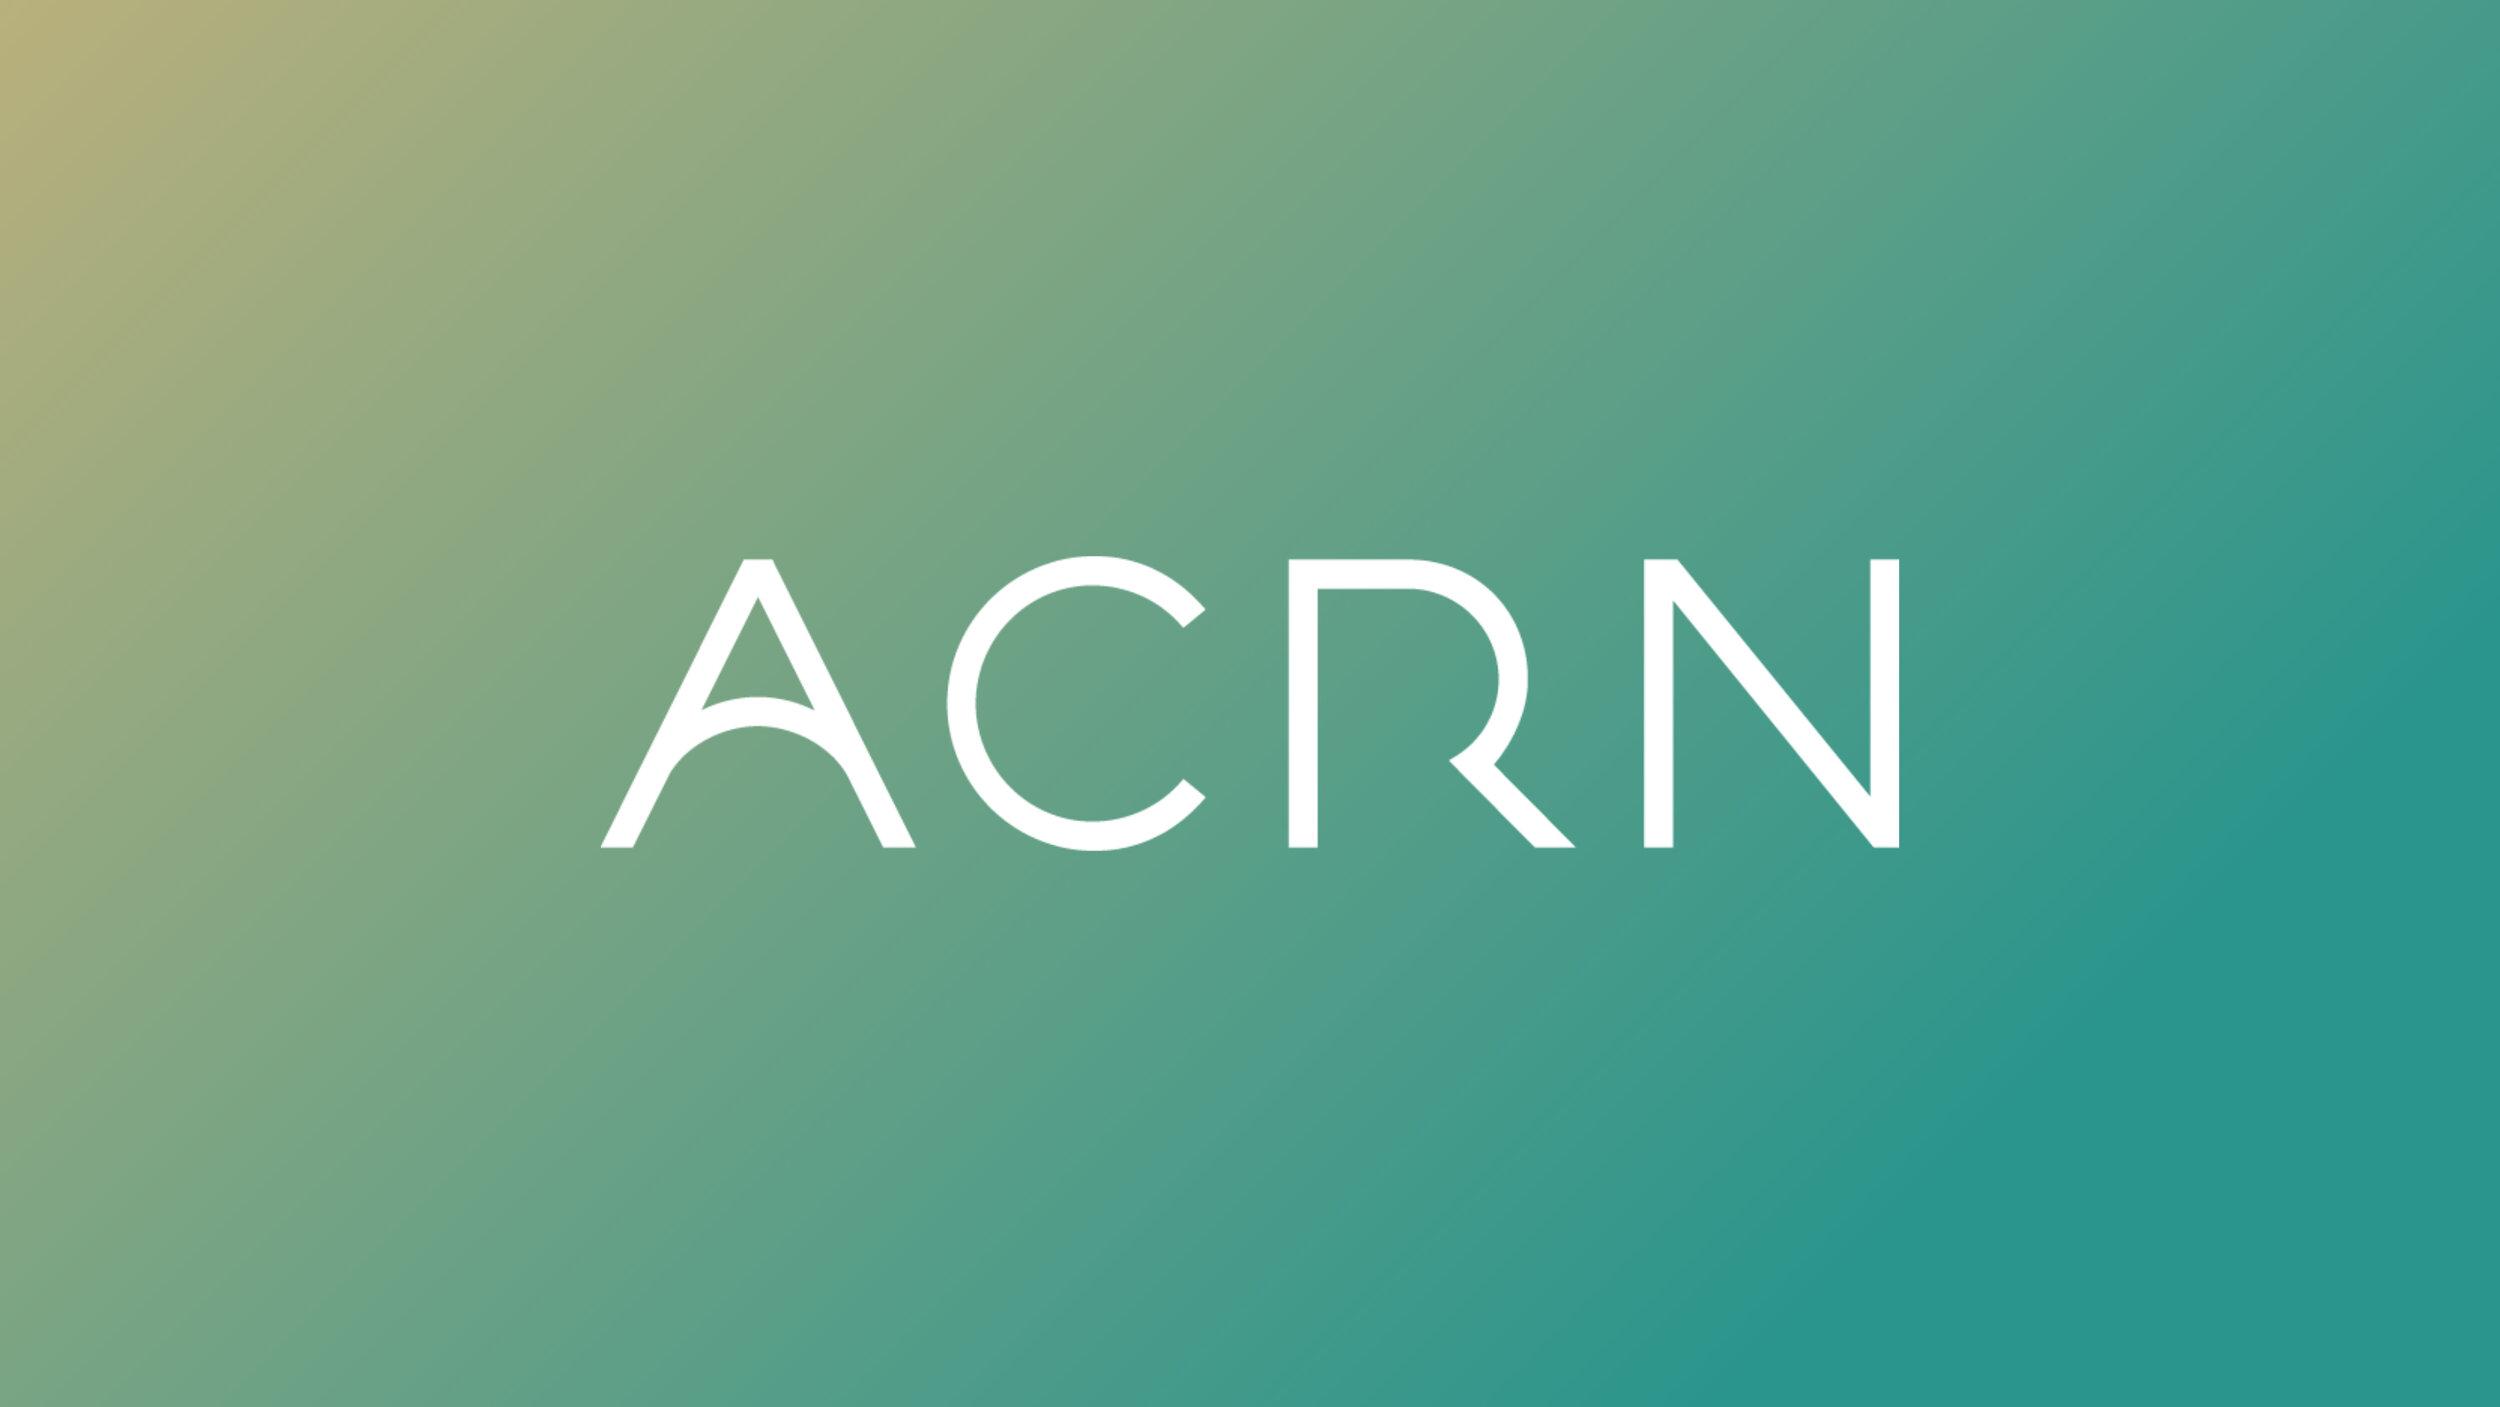 ACRN_Thumb.jpg